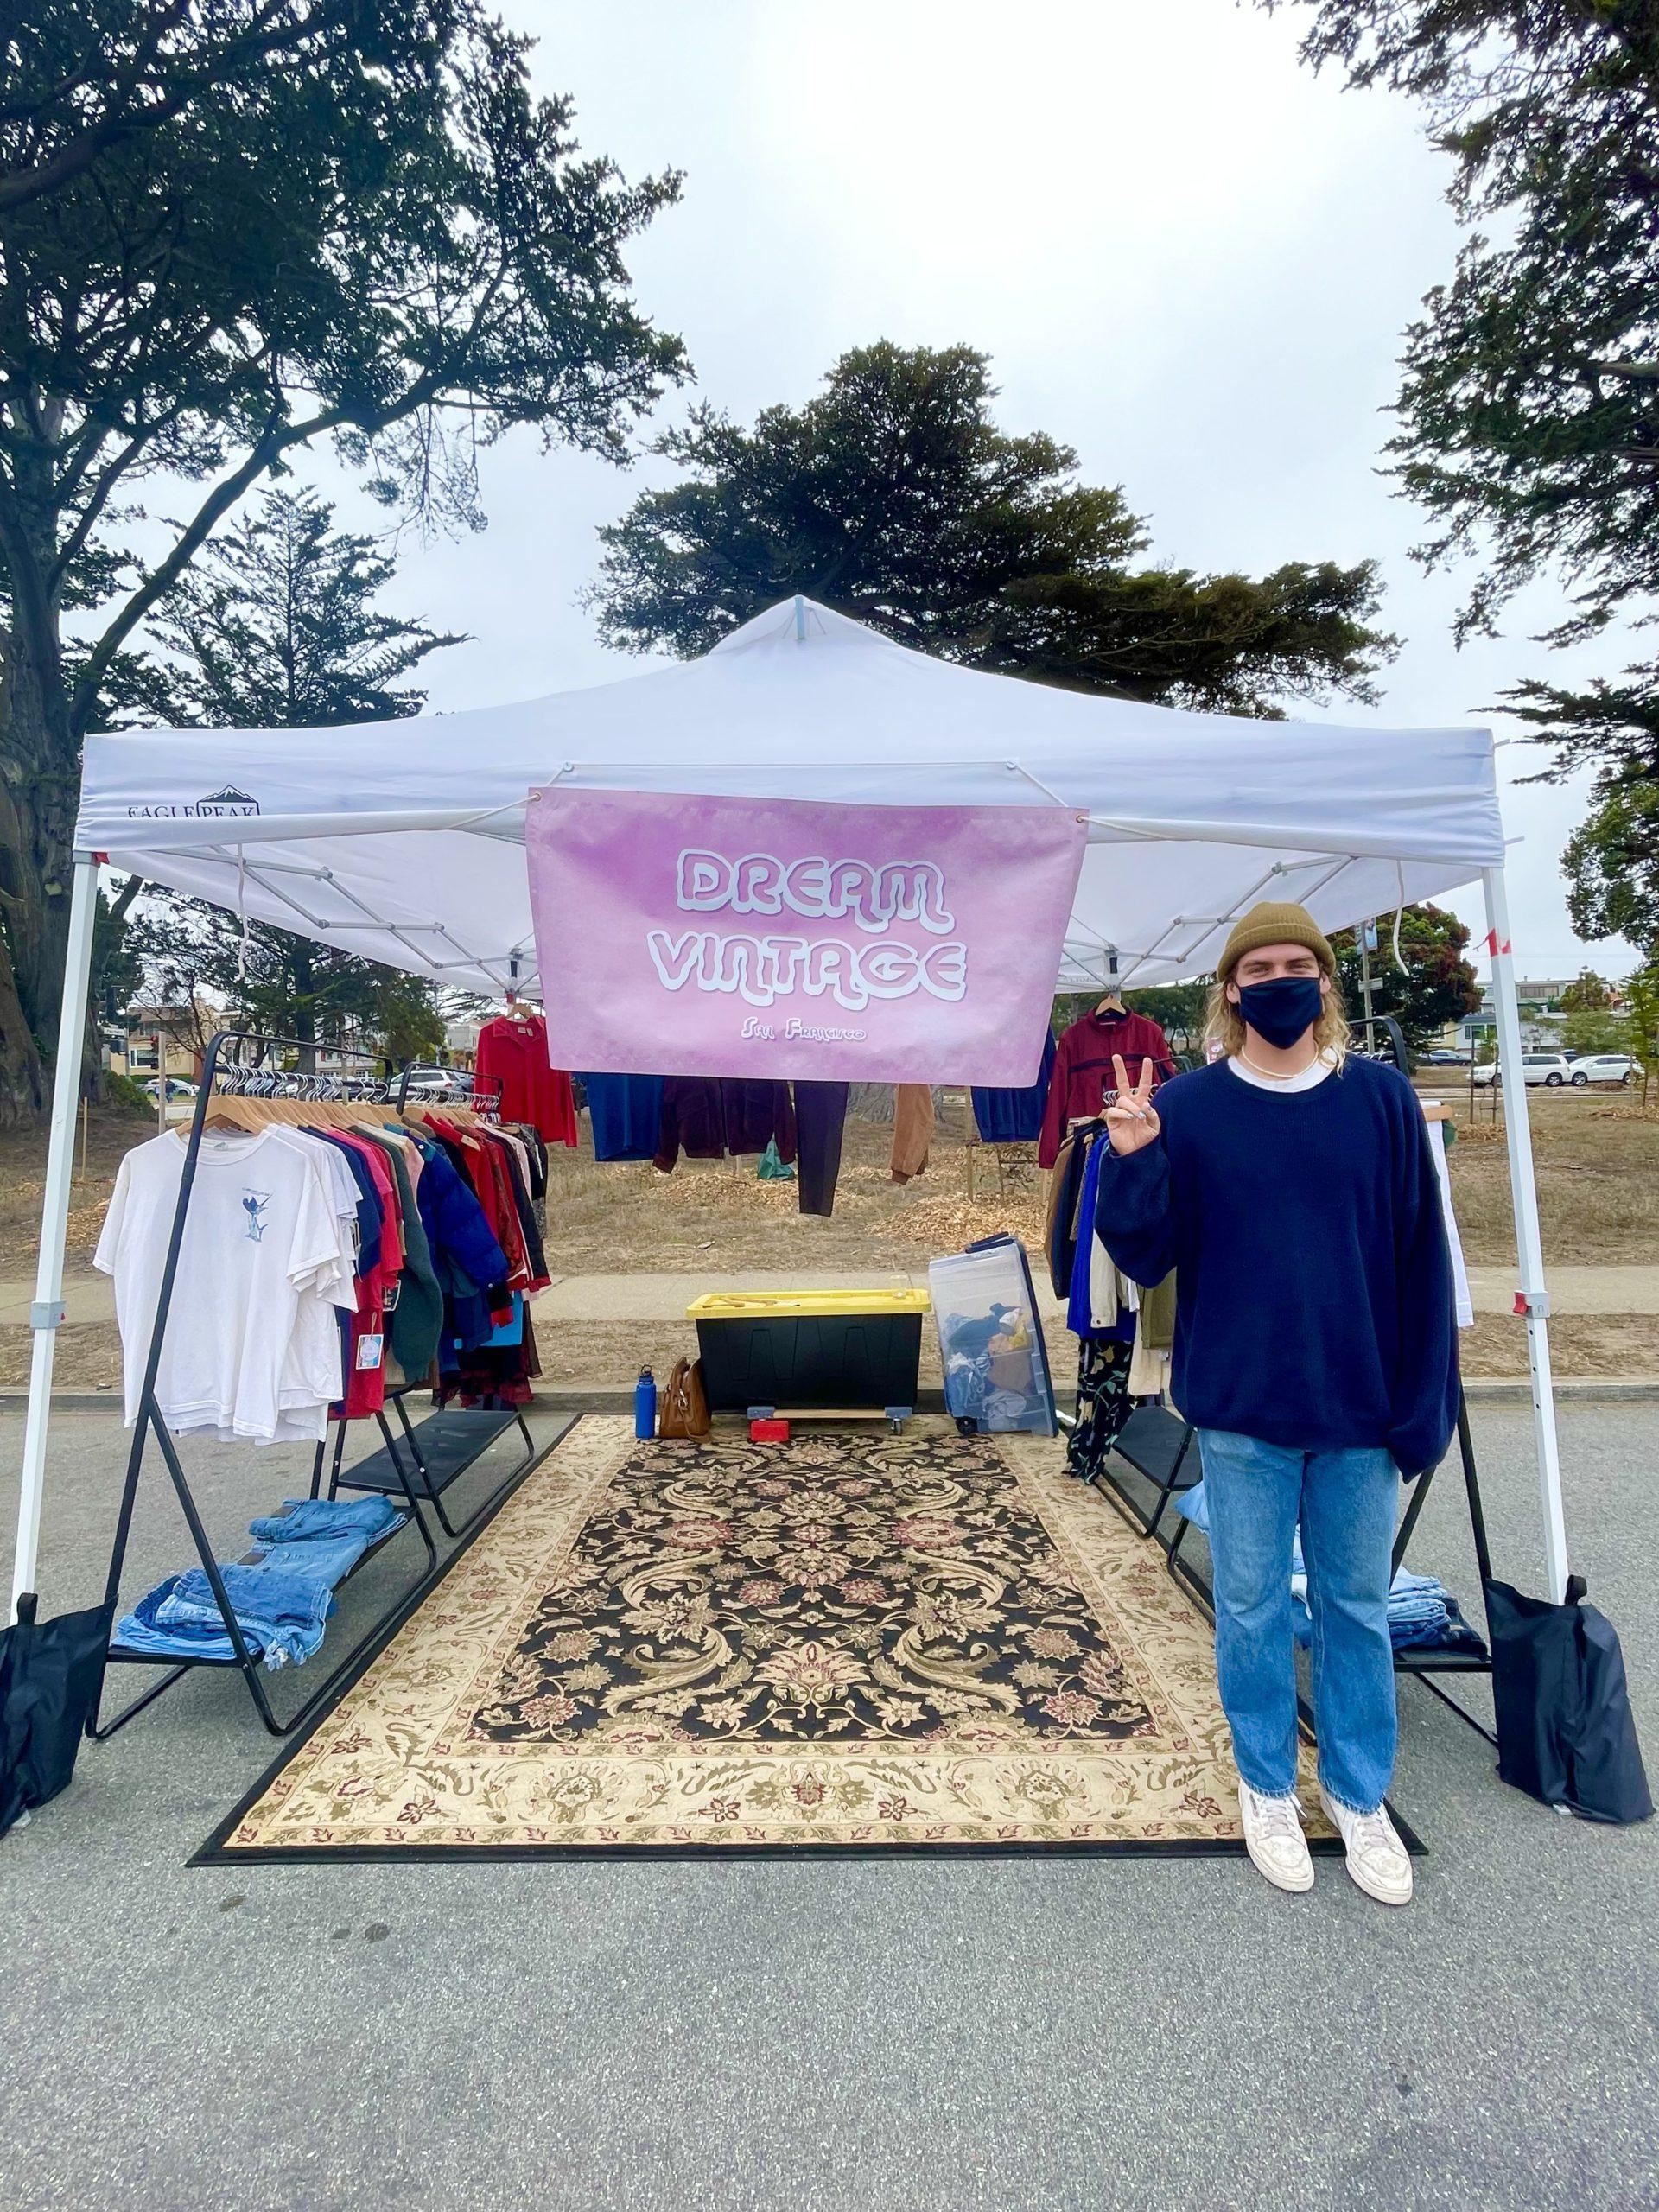 Sunset Community Mercantile: Secondhand Saturdays